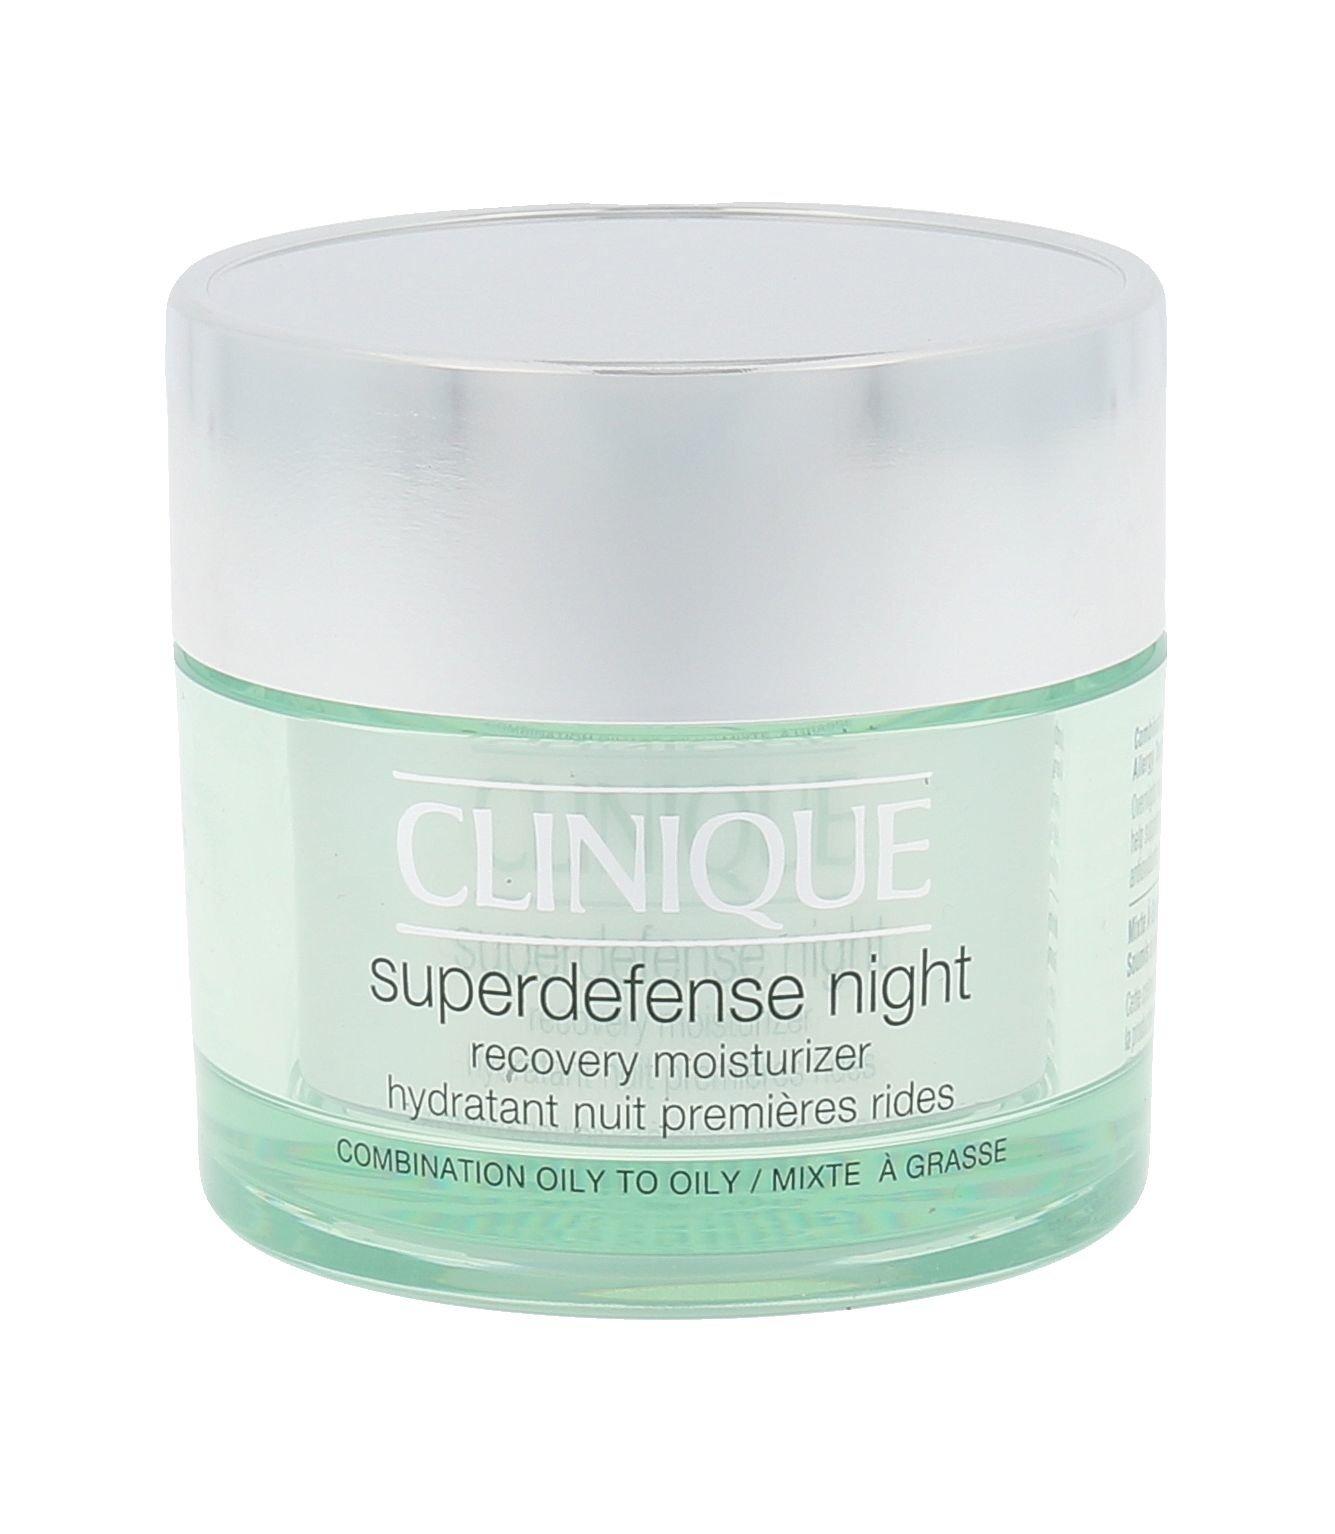 Clinique Superdefense Night Skin Cream 50ml